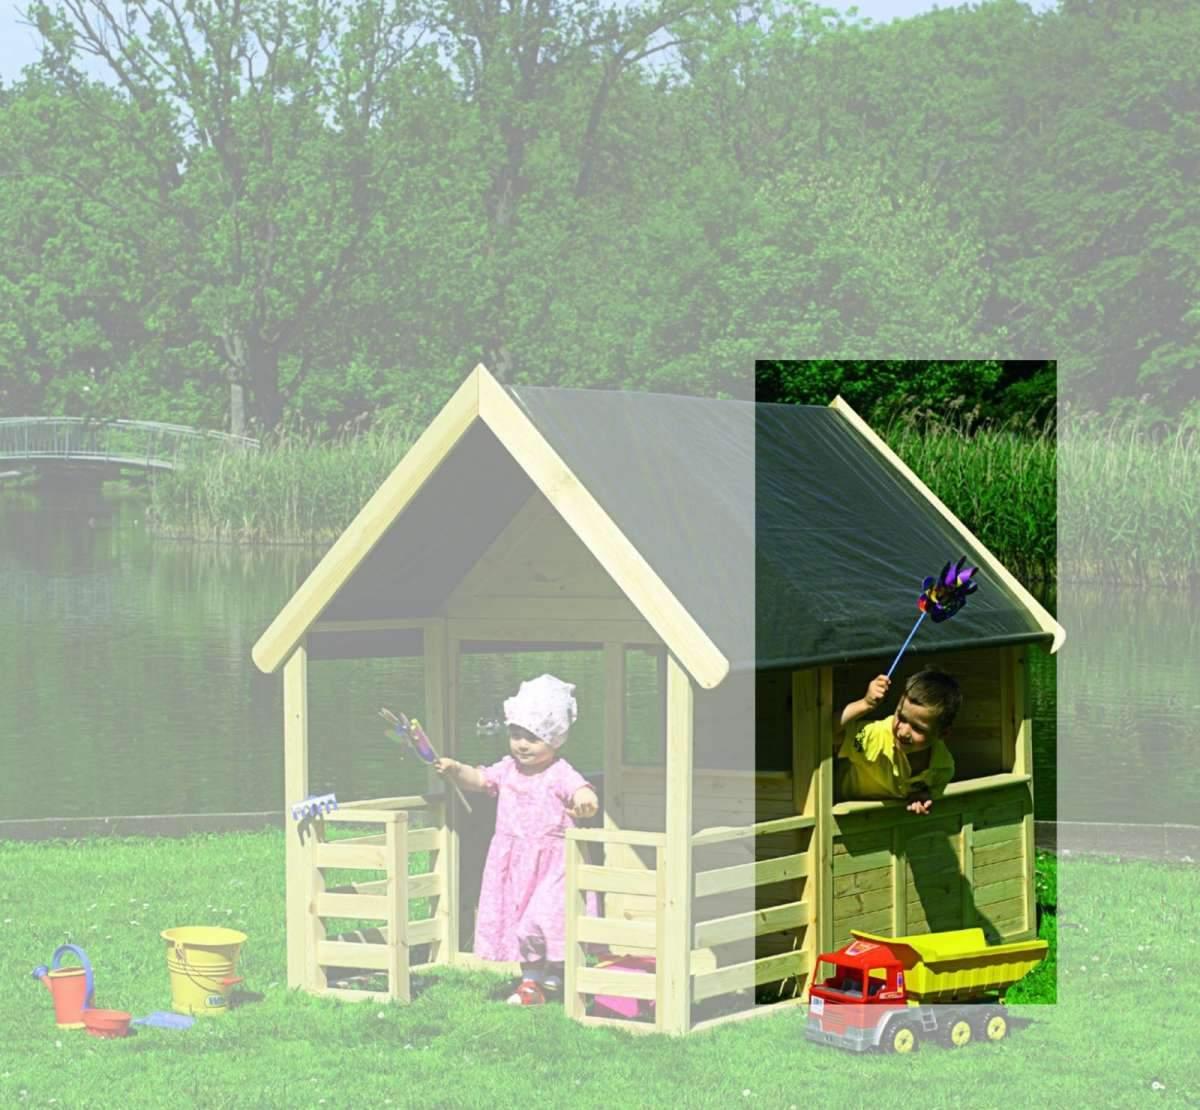 PromadinoSpielhausMoritznatur 1 213f d0a56ac61cc8 600x600 2x